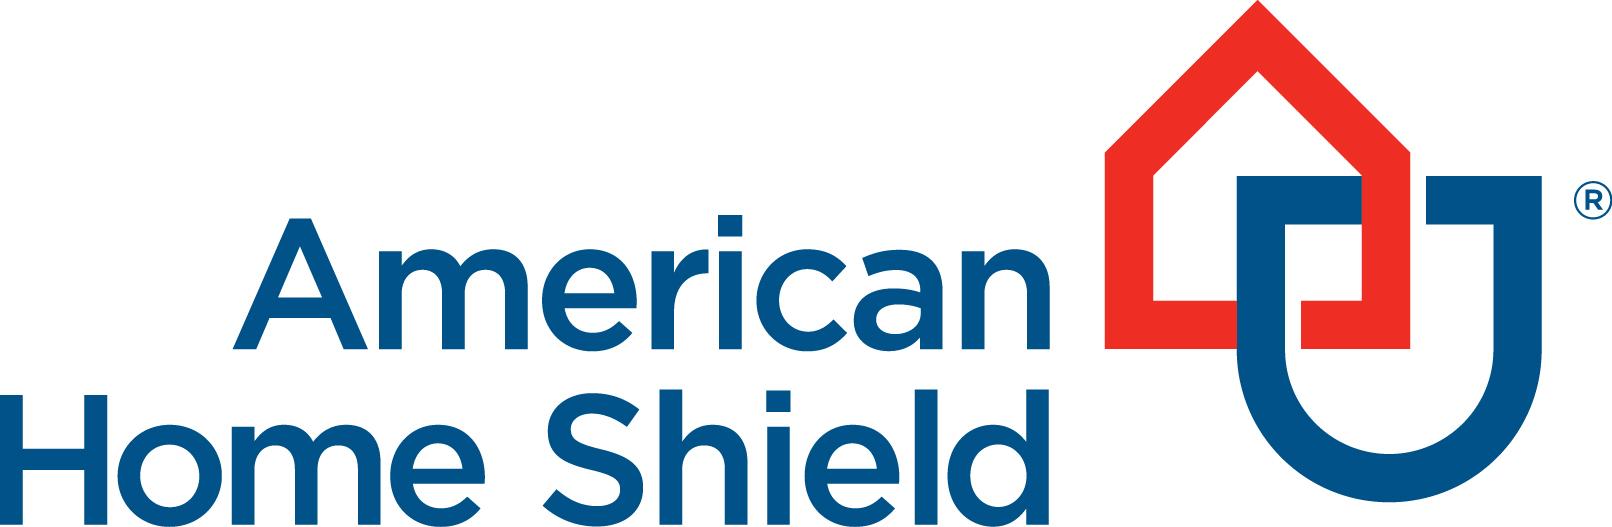 American Home Shield Acquires Landmark Home Warranty